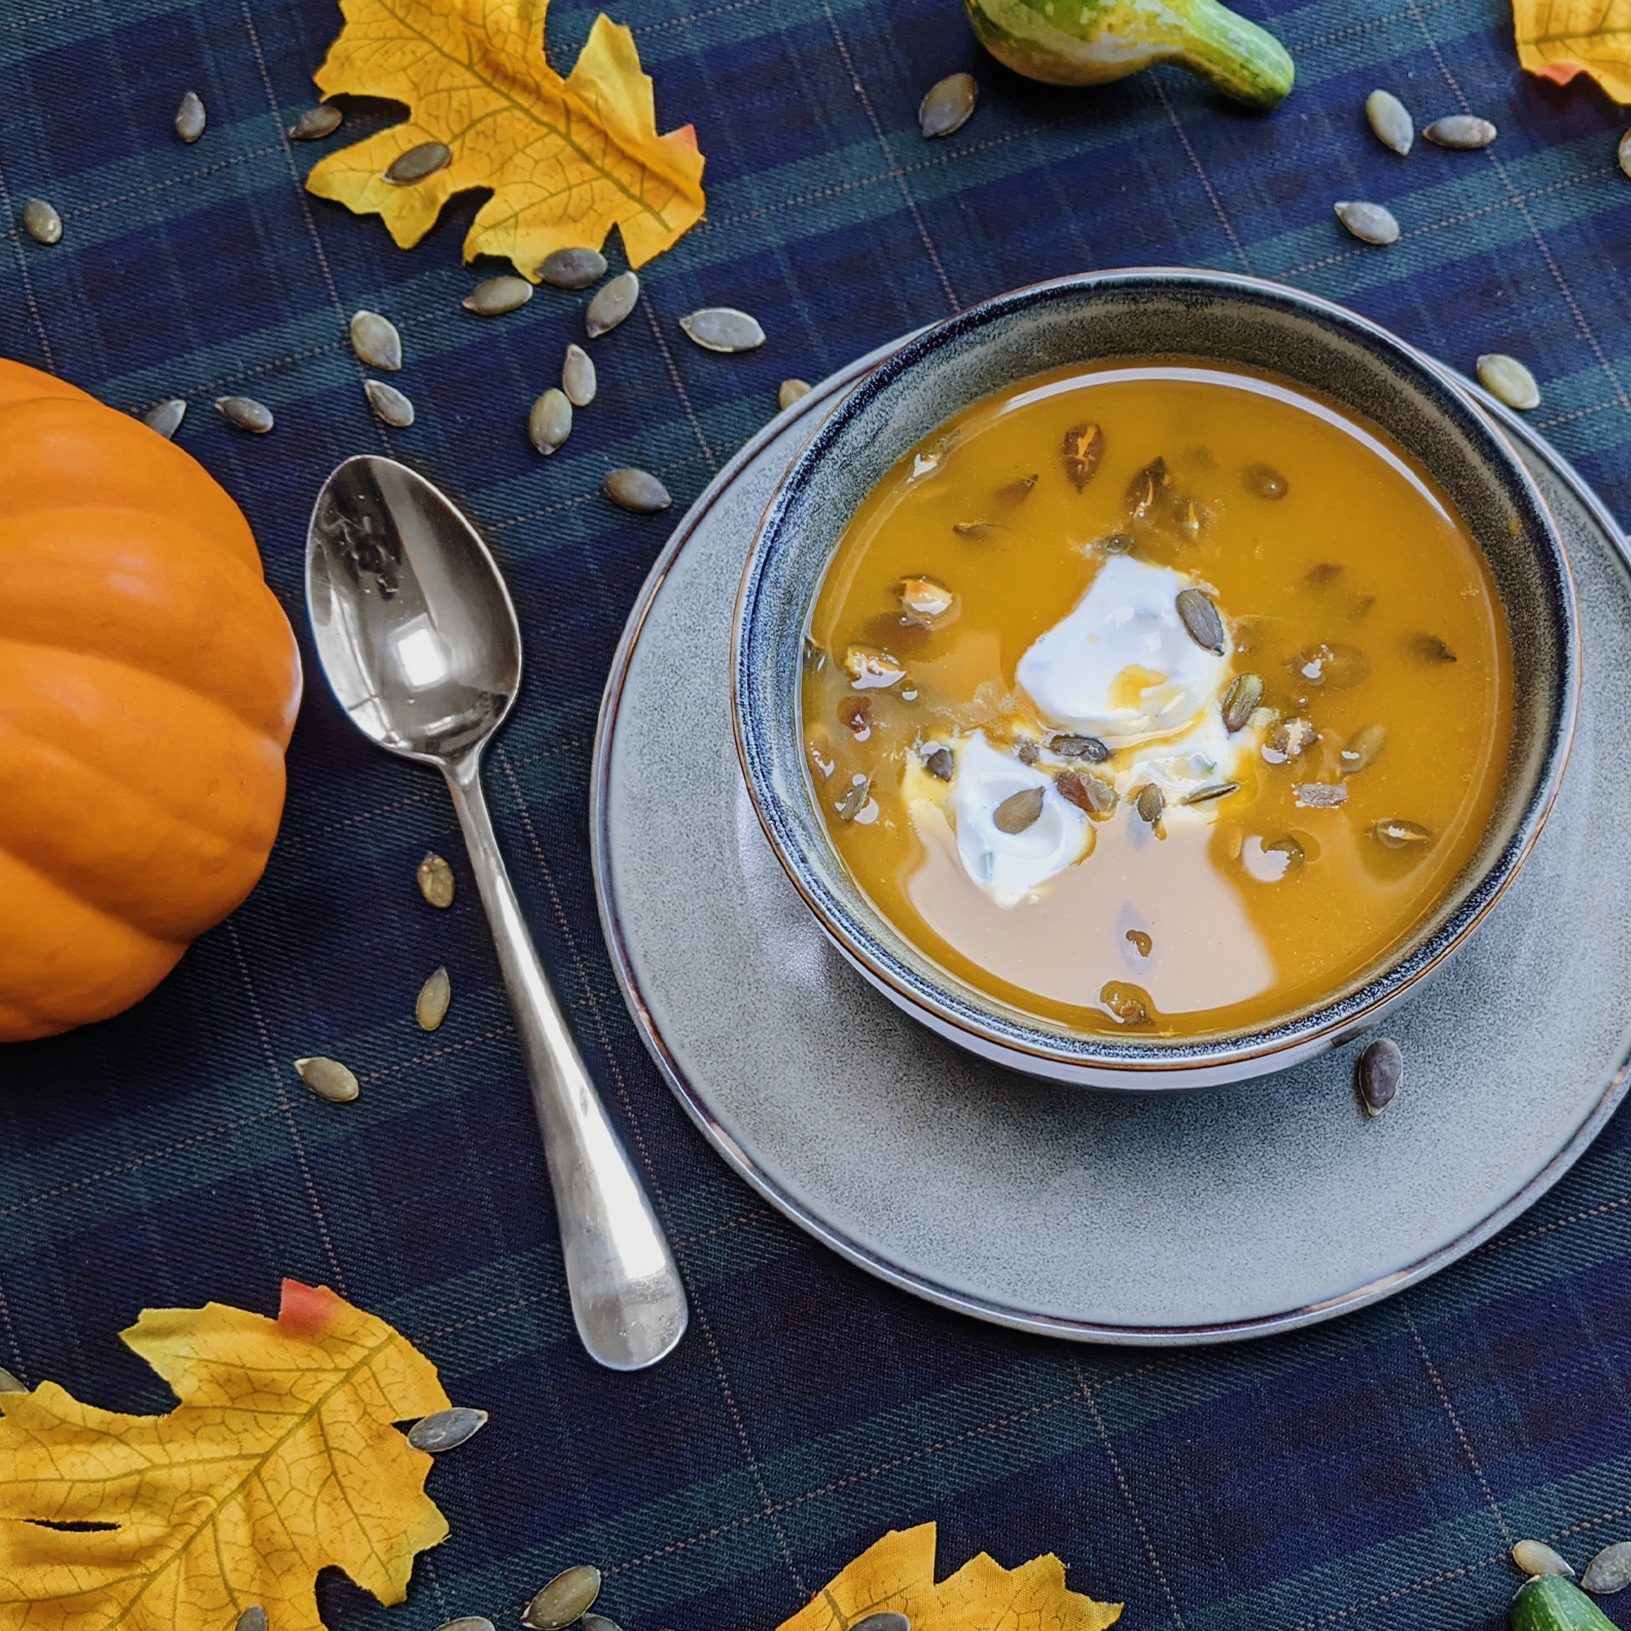 oktoberdots Flespompoen-soep met bieslook-crème fraîche recept